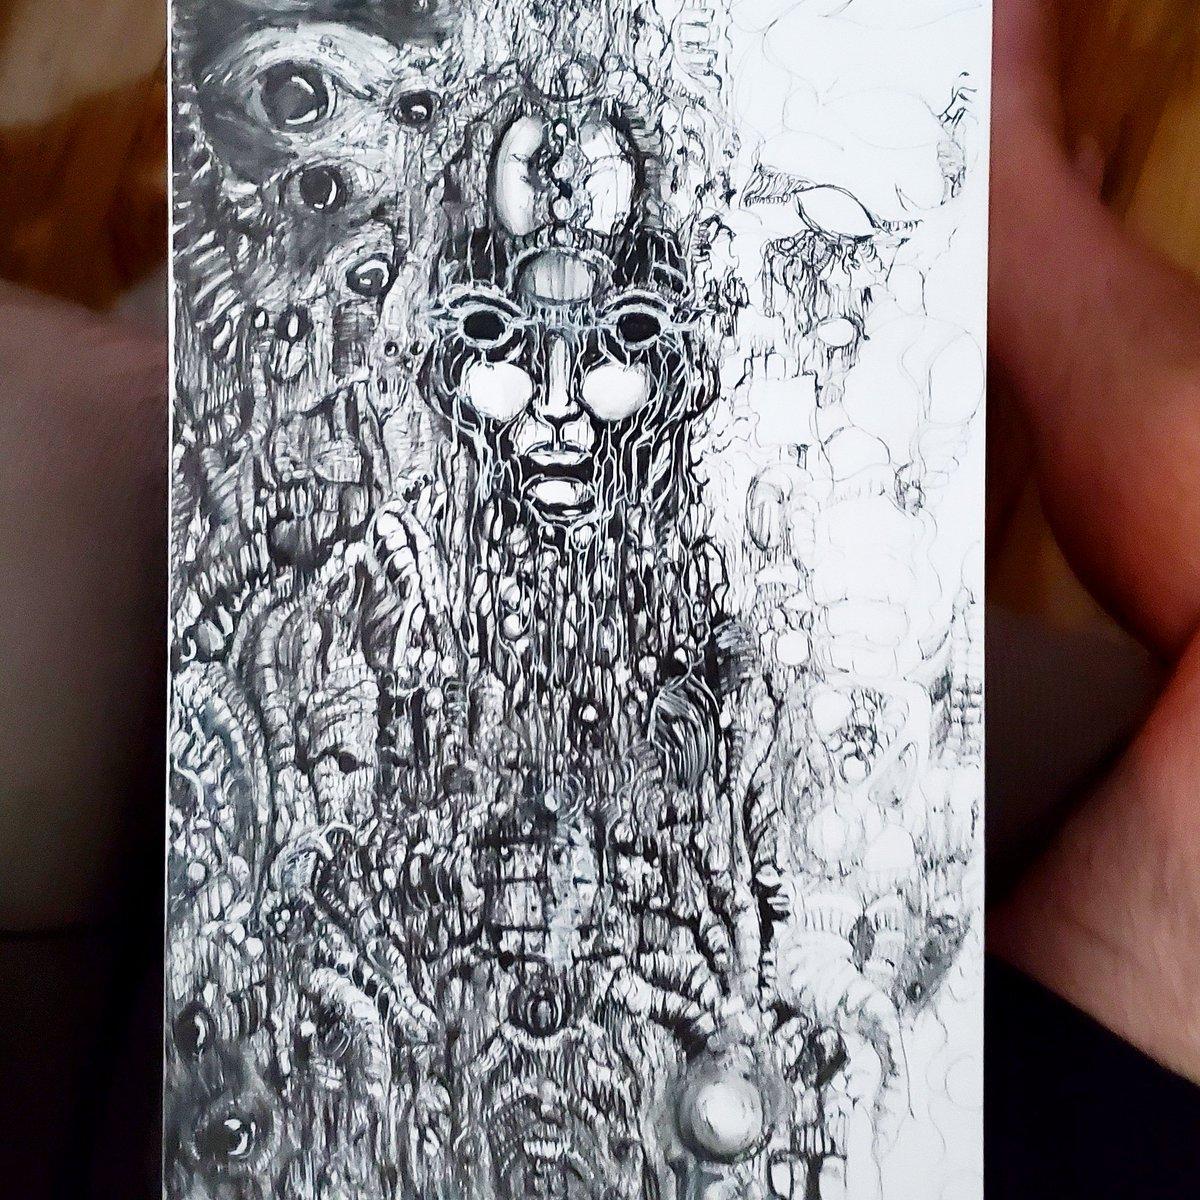 Day 3 and filling details 11x17 freehand pen and ink #wip #drawing #art #artwork #ArtistOnTwitter #illustration #otherworldly #surreal #darksurrealism #macabre #gothic  #originalart #penandink #darkart #darkartwork https://t.co/foHJgRFLkG